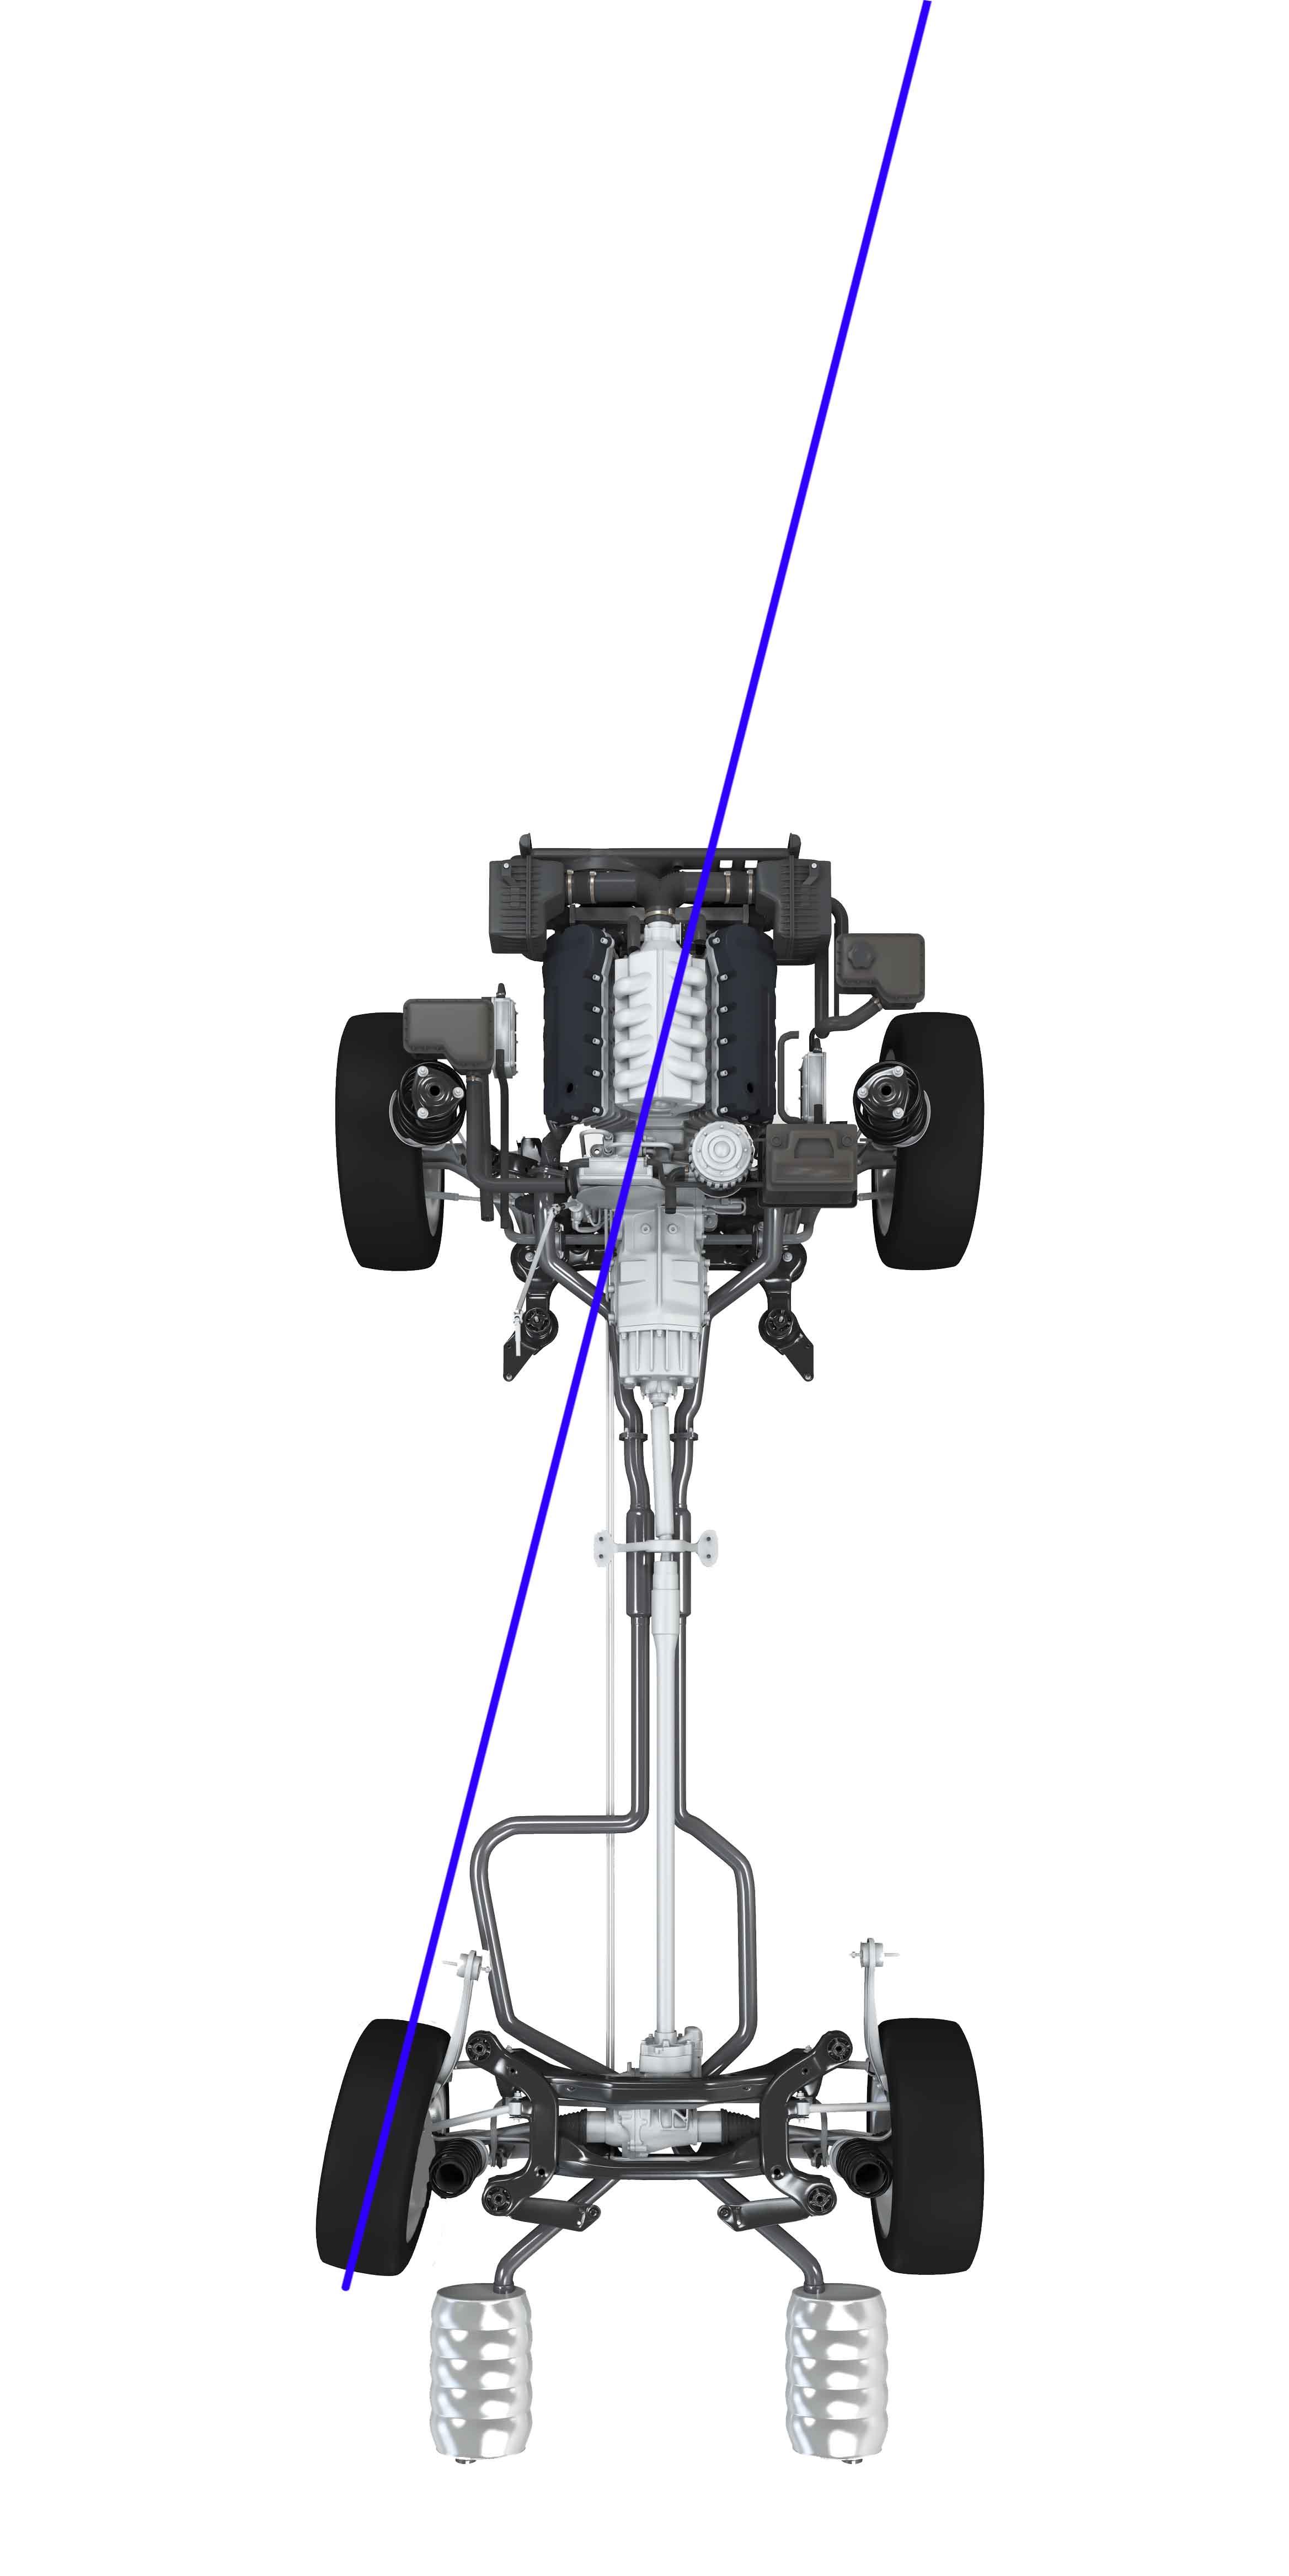 82-Fahrzeuglängsmittelebene-geometrische Fahrachse-HA-verstellt-Spurlinielinks-web